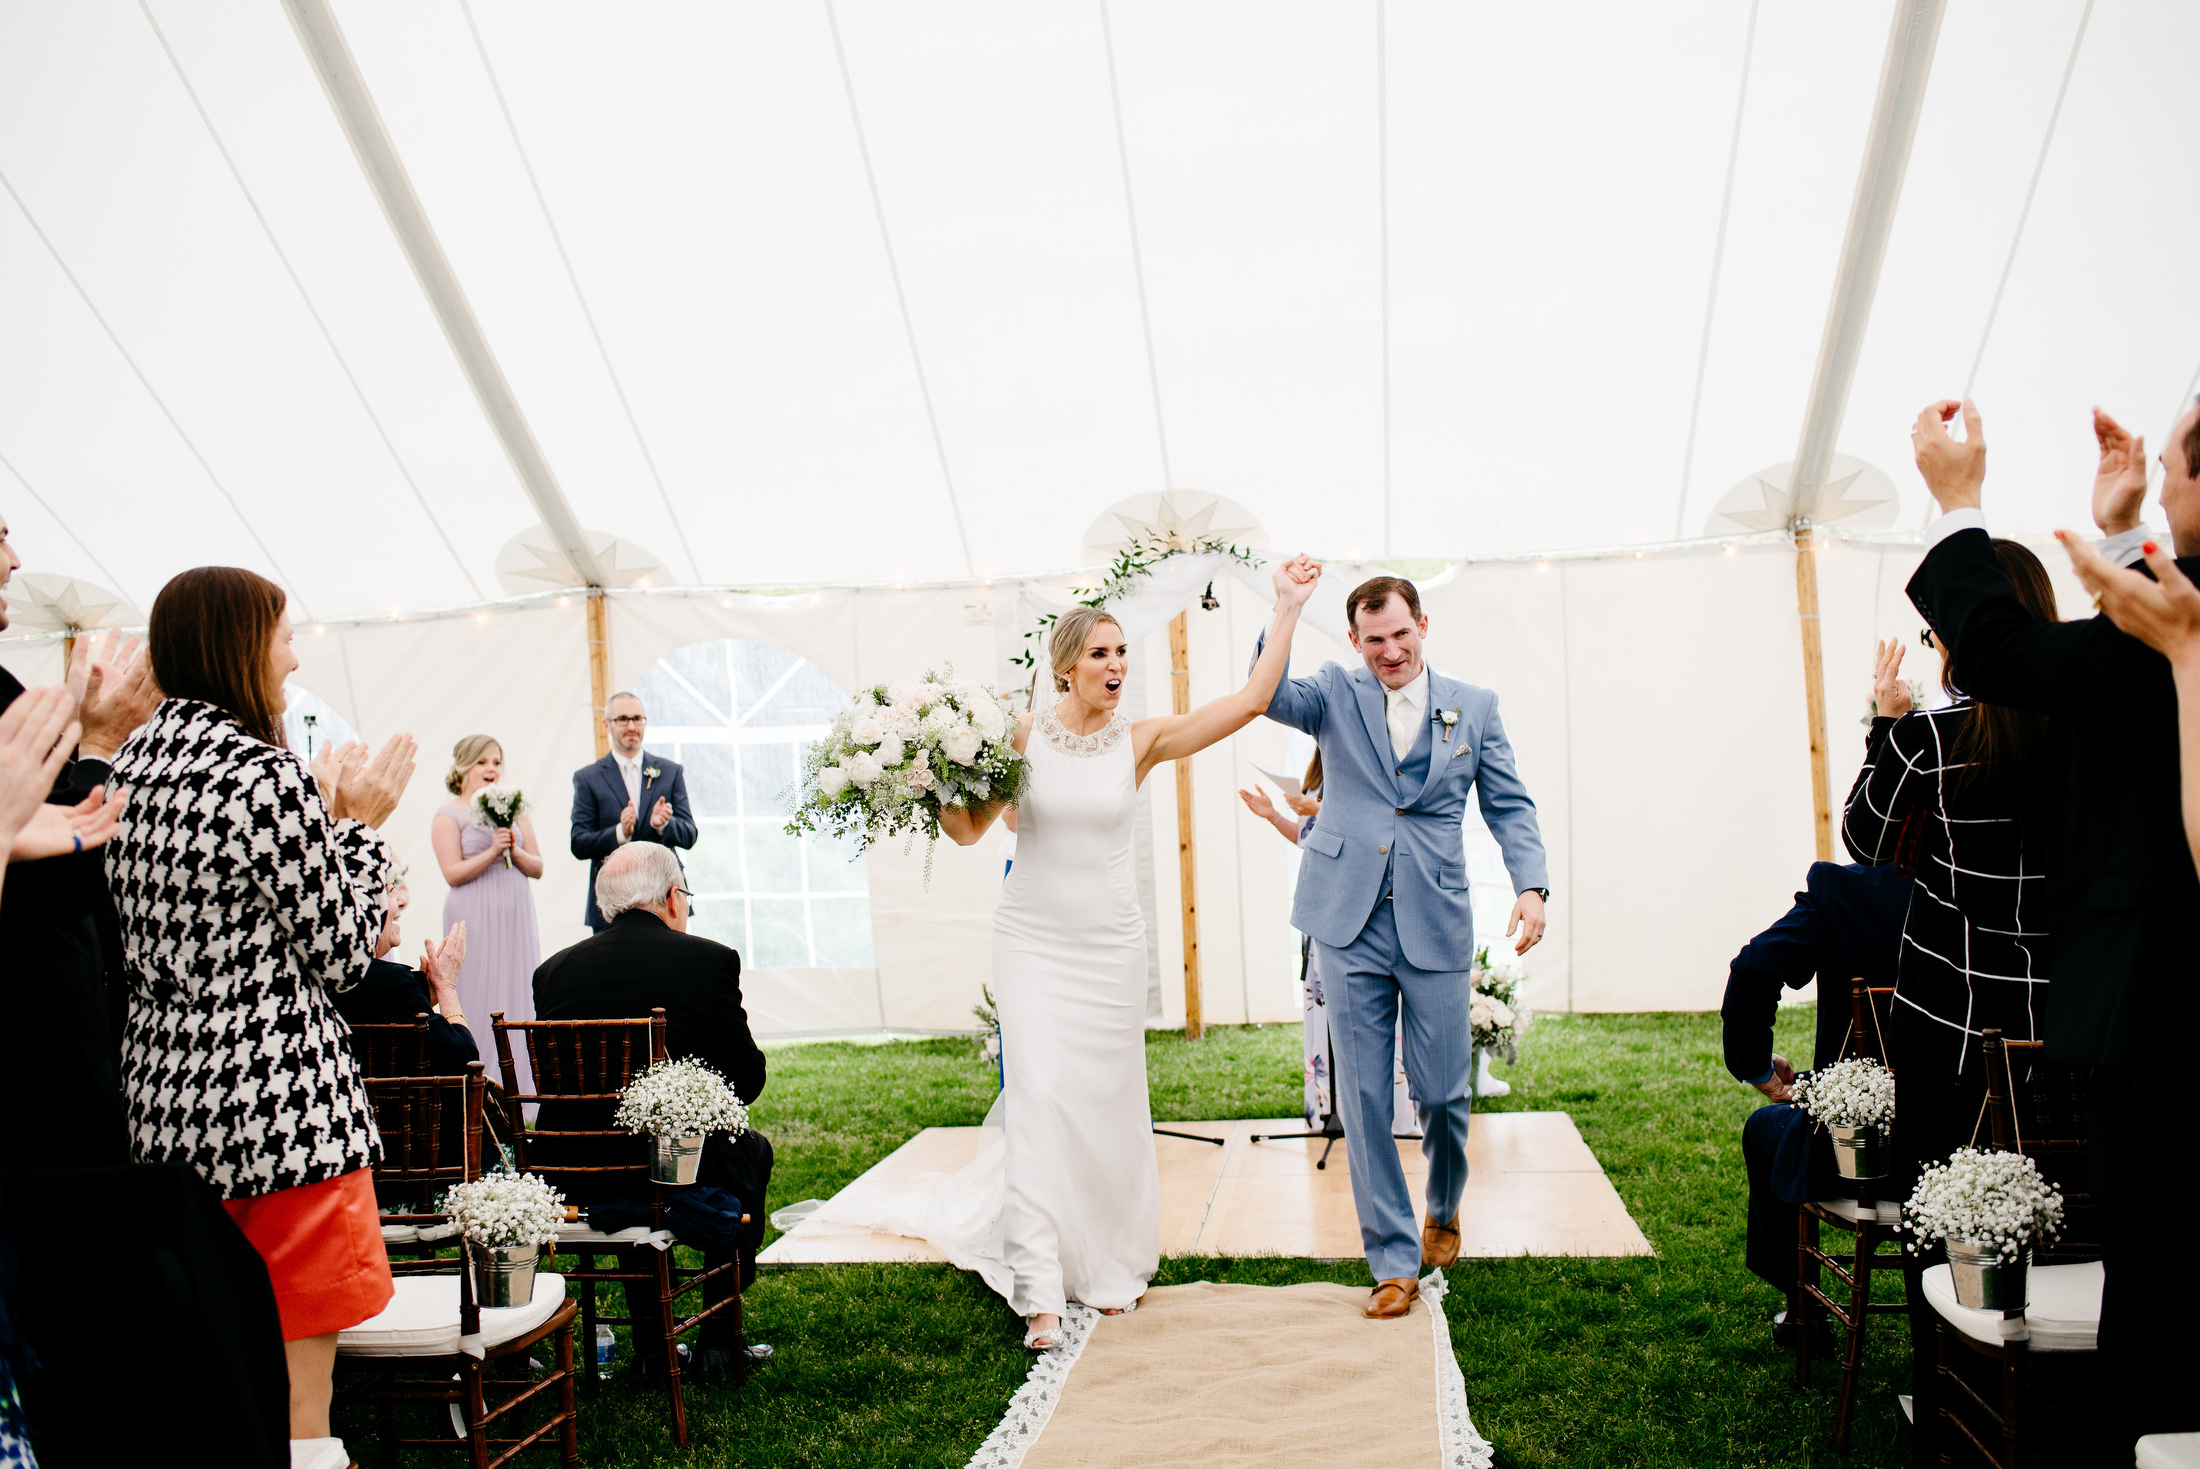 dennis_inn_wedding_mikhail_glabets_26.JPG